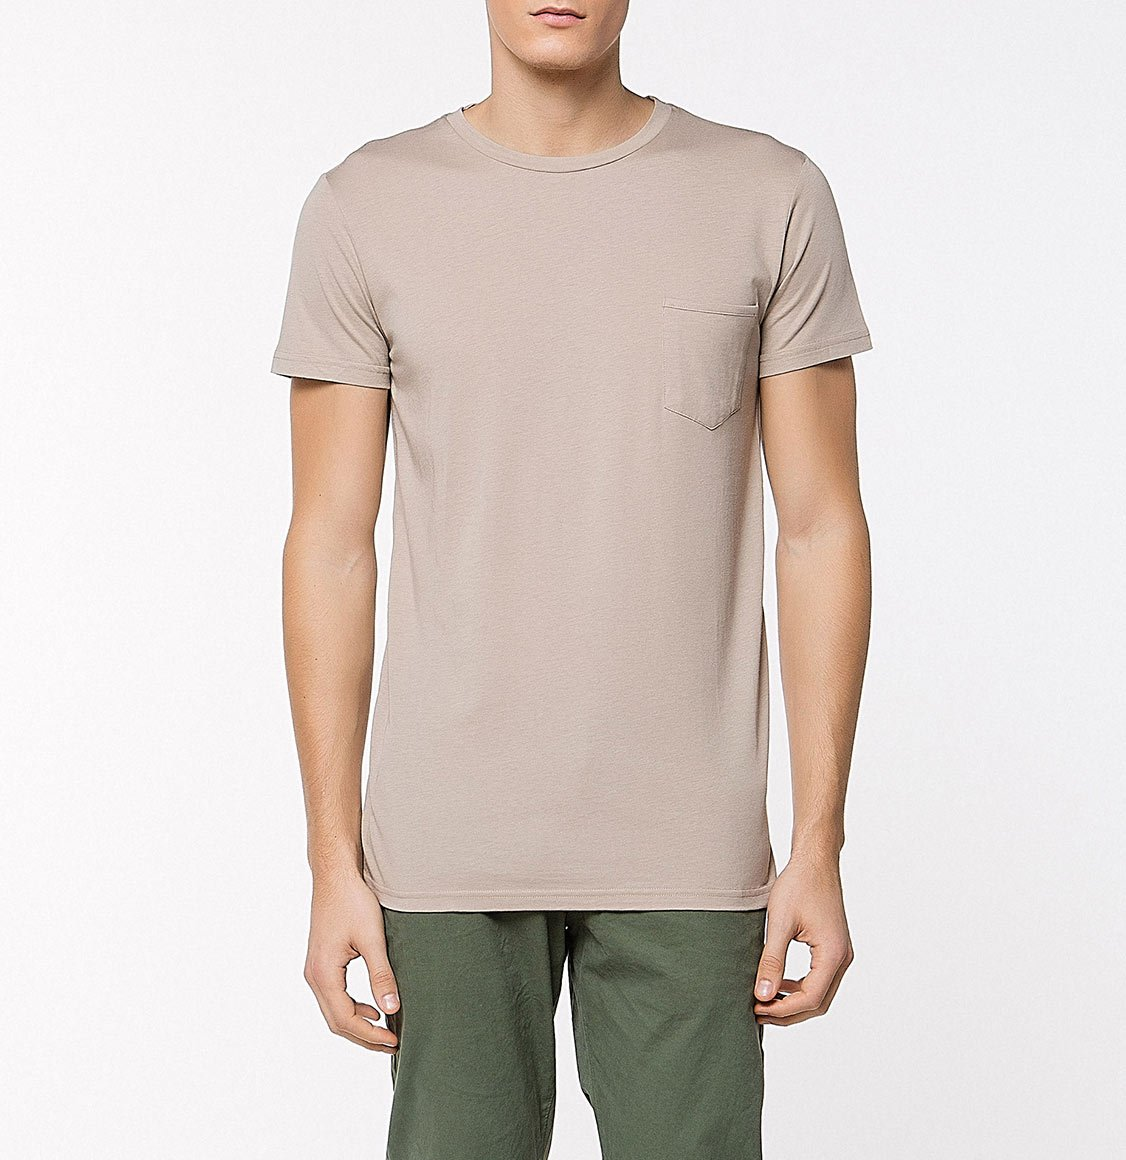 The Project Garments Crew Neck Modal-Blend Pocket T-Shirt Beige